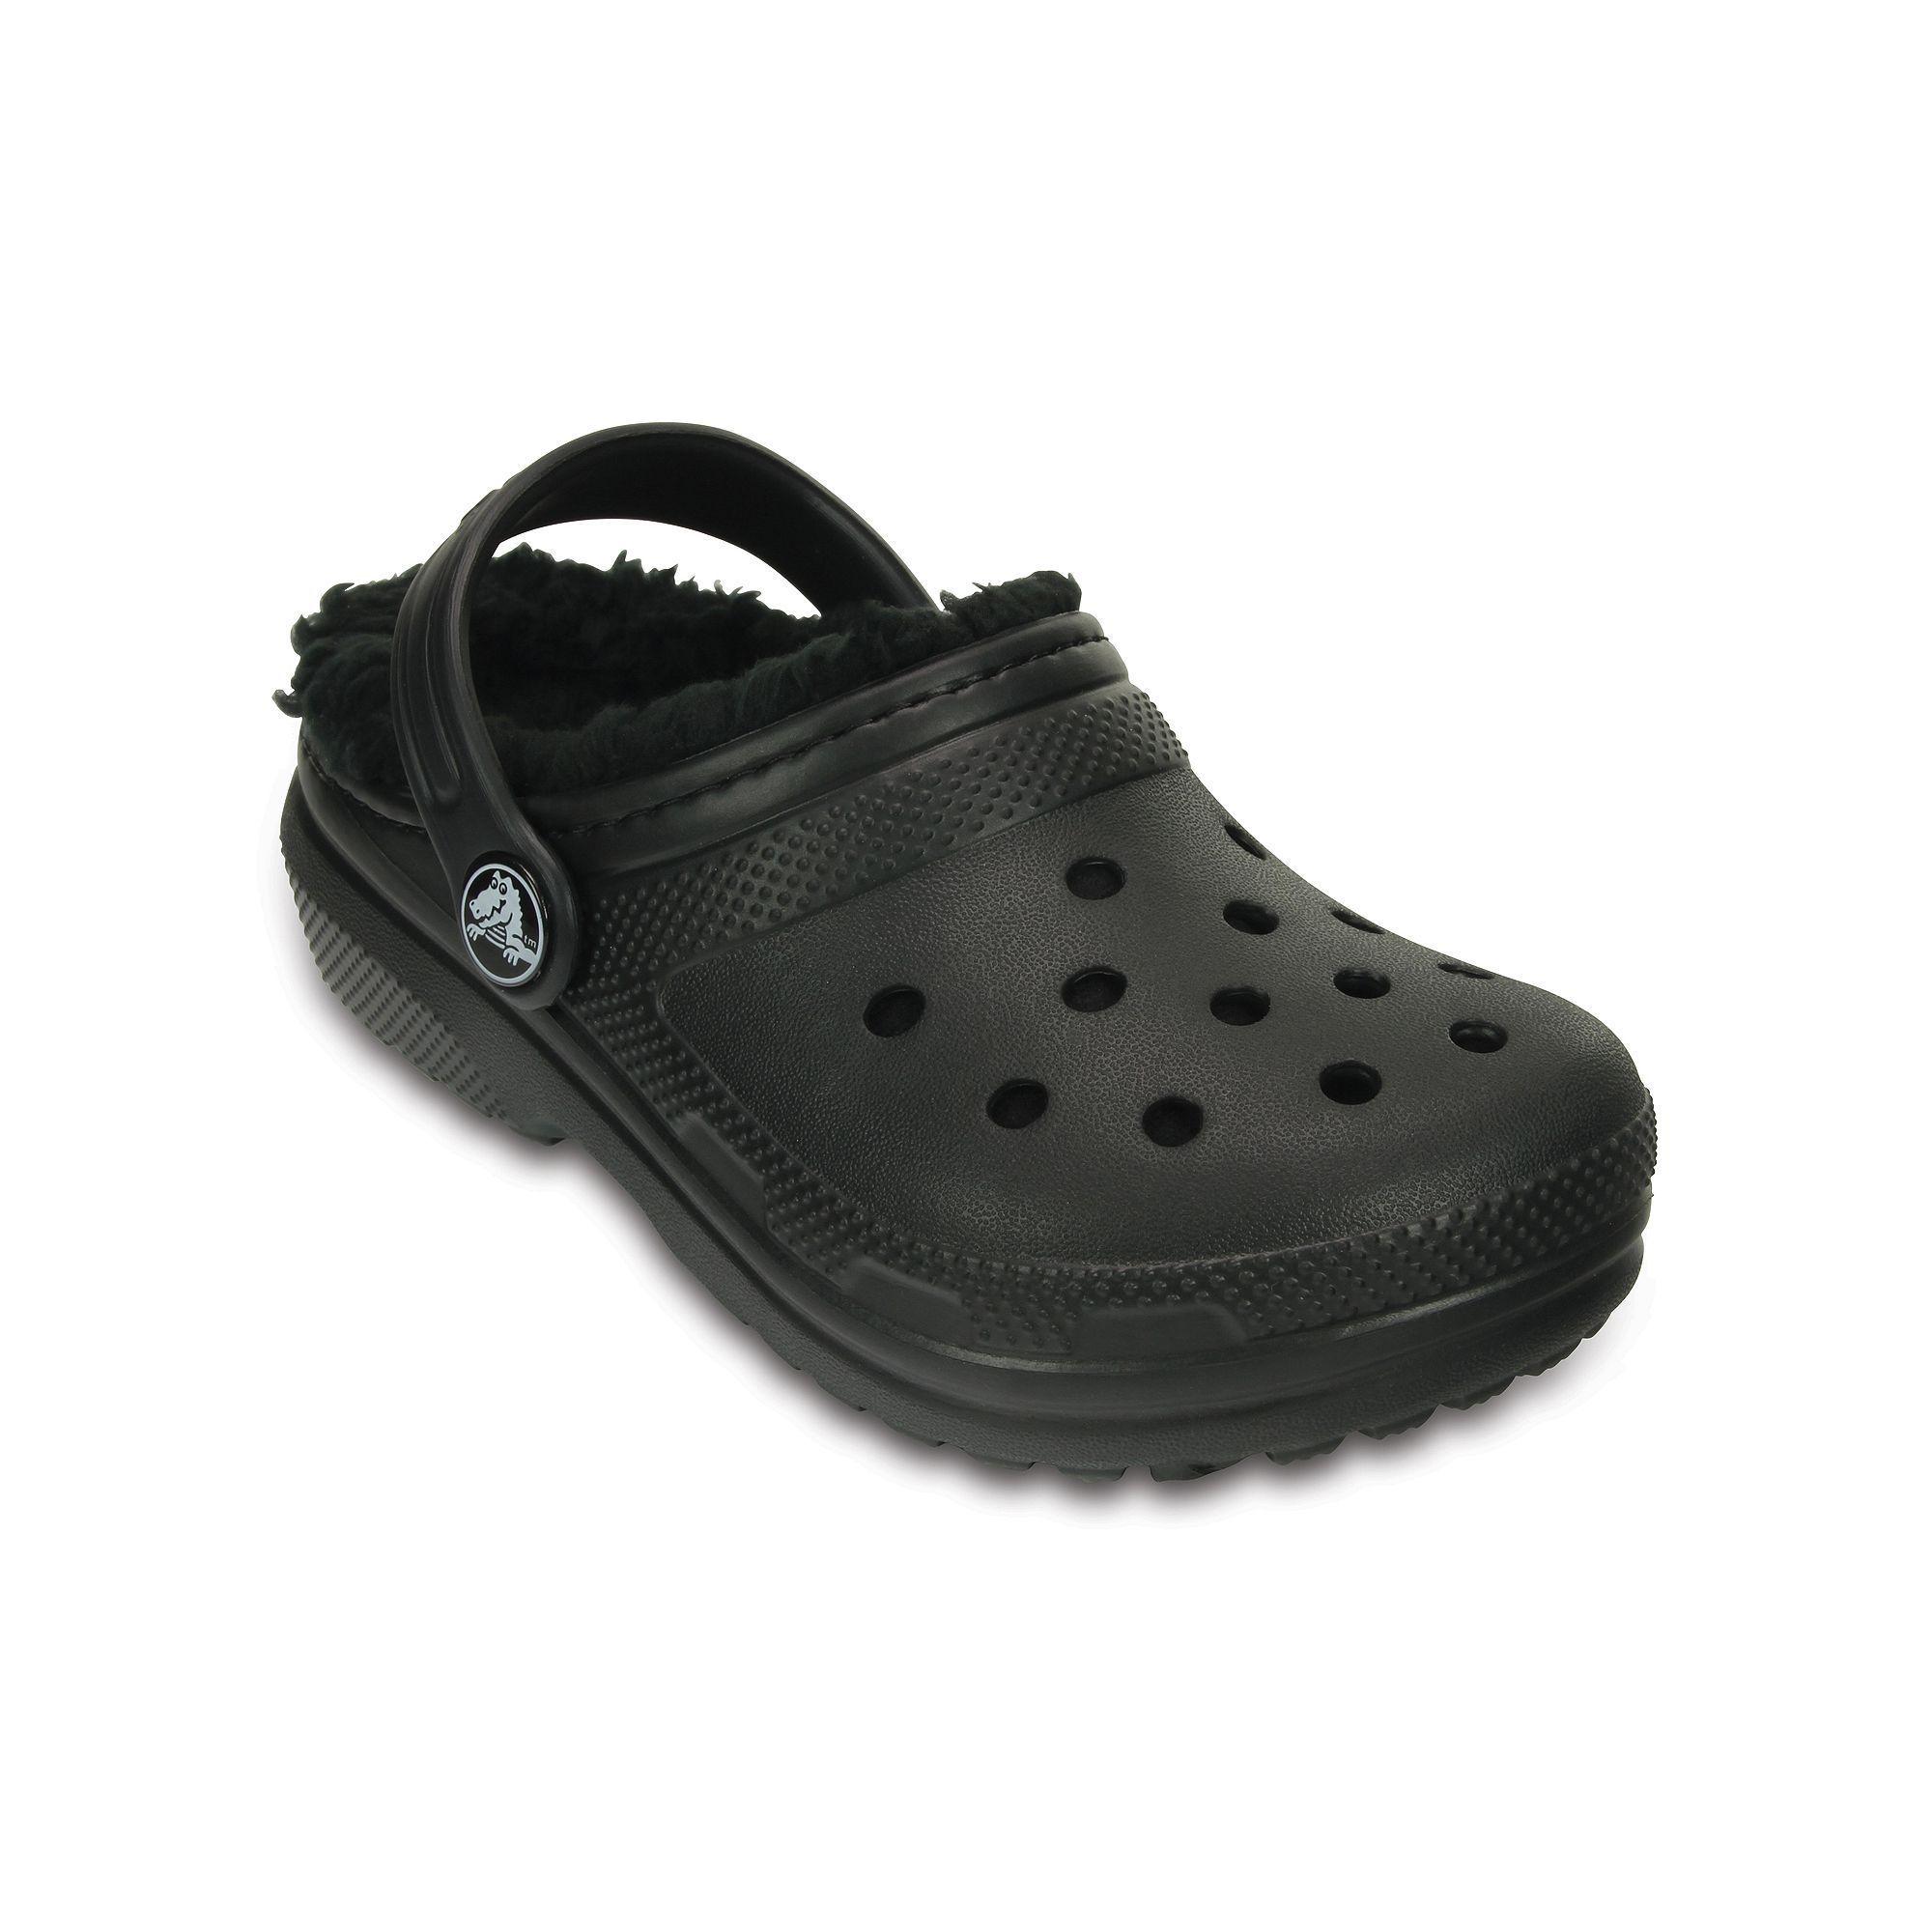 5c7ffb1b6456c Crocs Classic Lined Boys' Clogs | Products | Crocs classic, Crocs ...